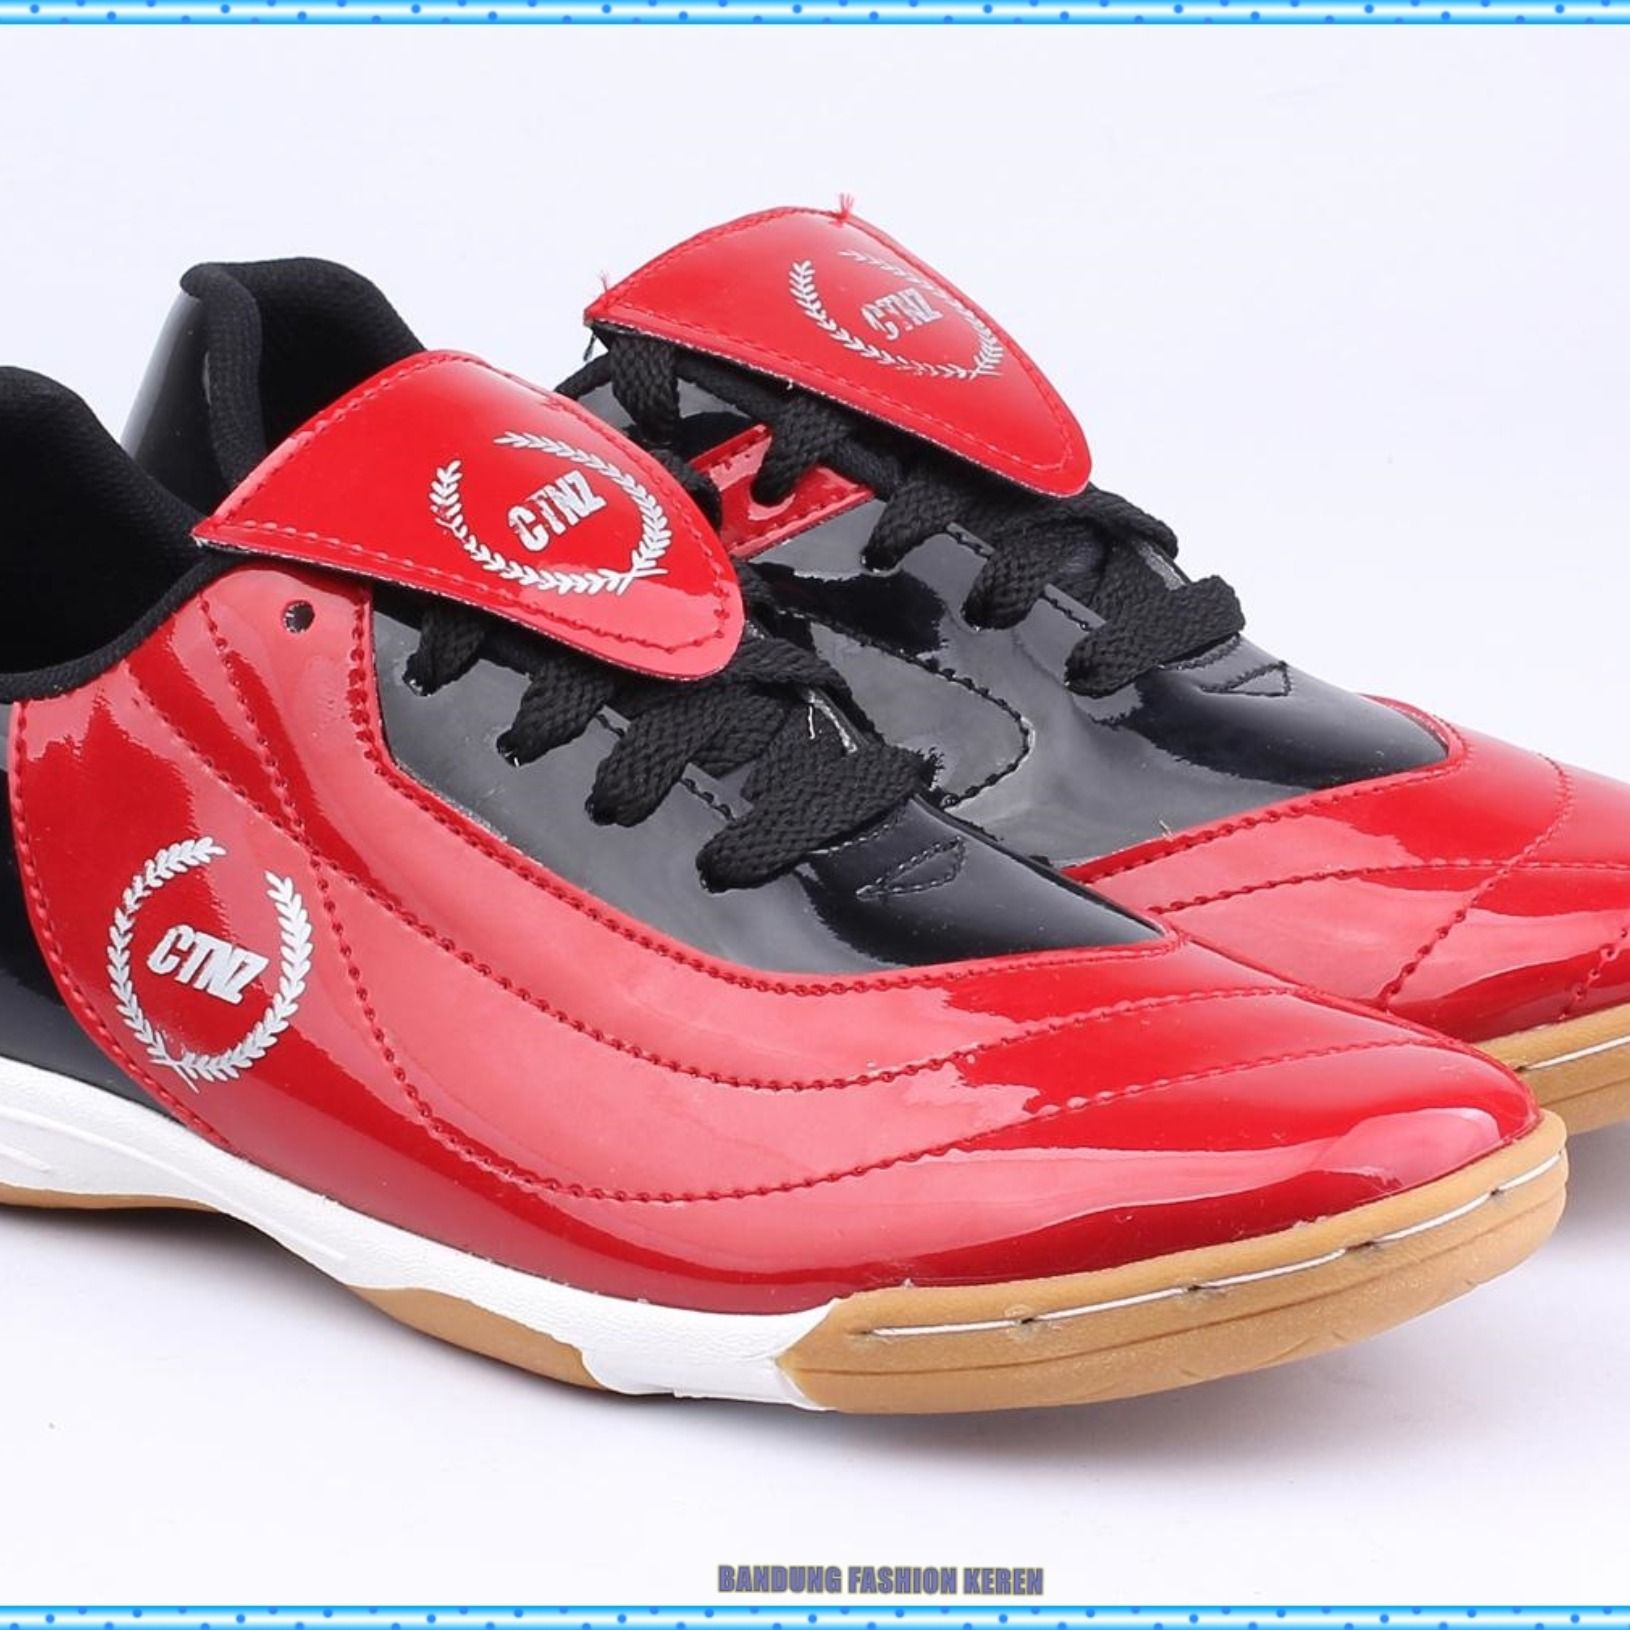 Sepatu Futsal Pria Dy 002 Produk Fashion Handmade Terbaik 100